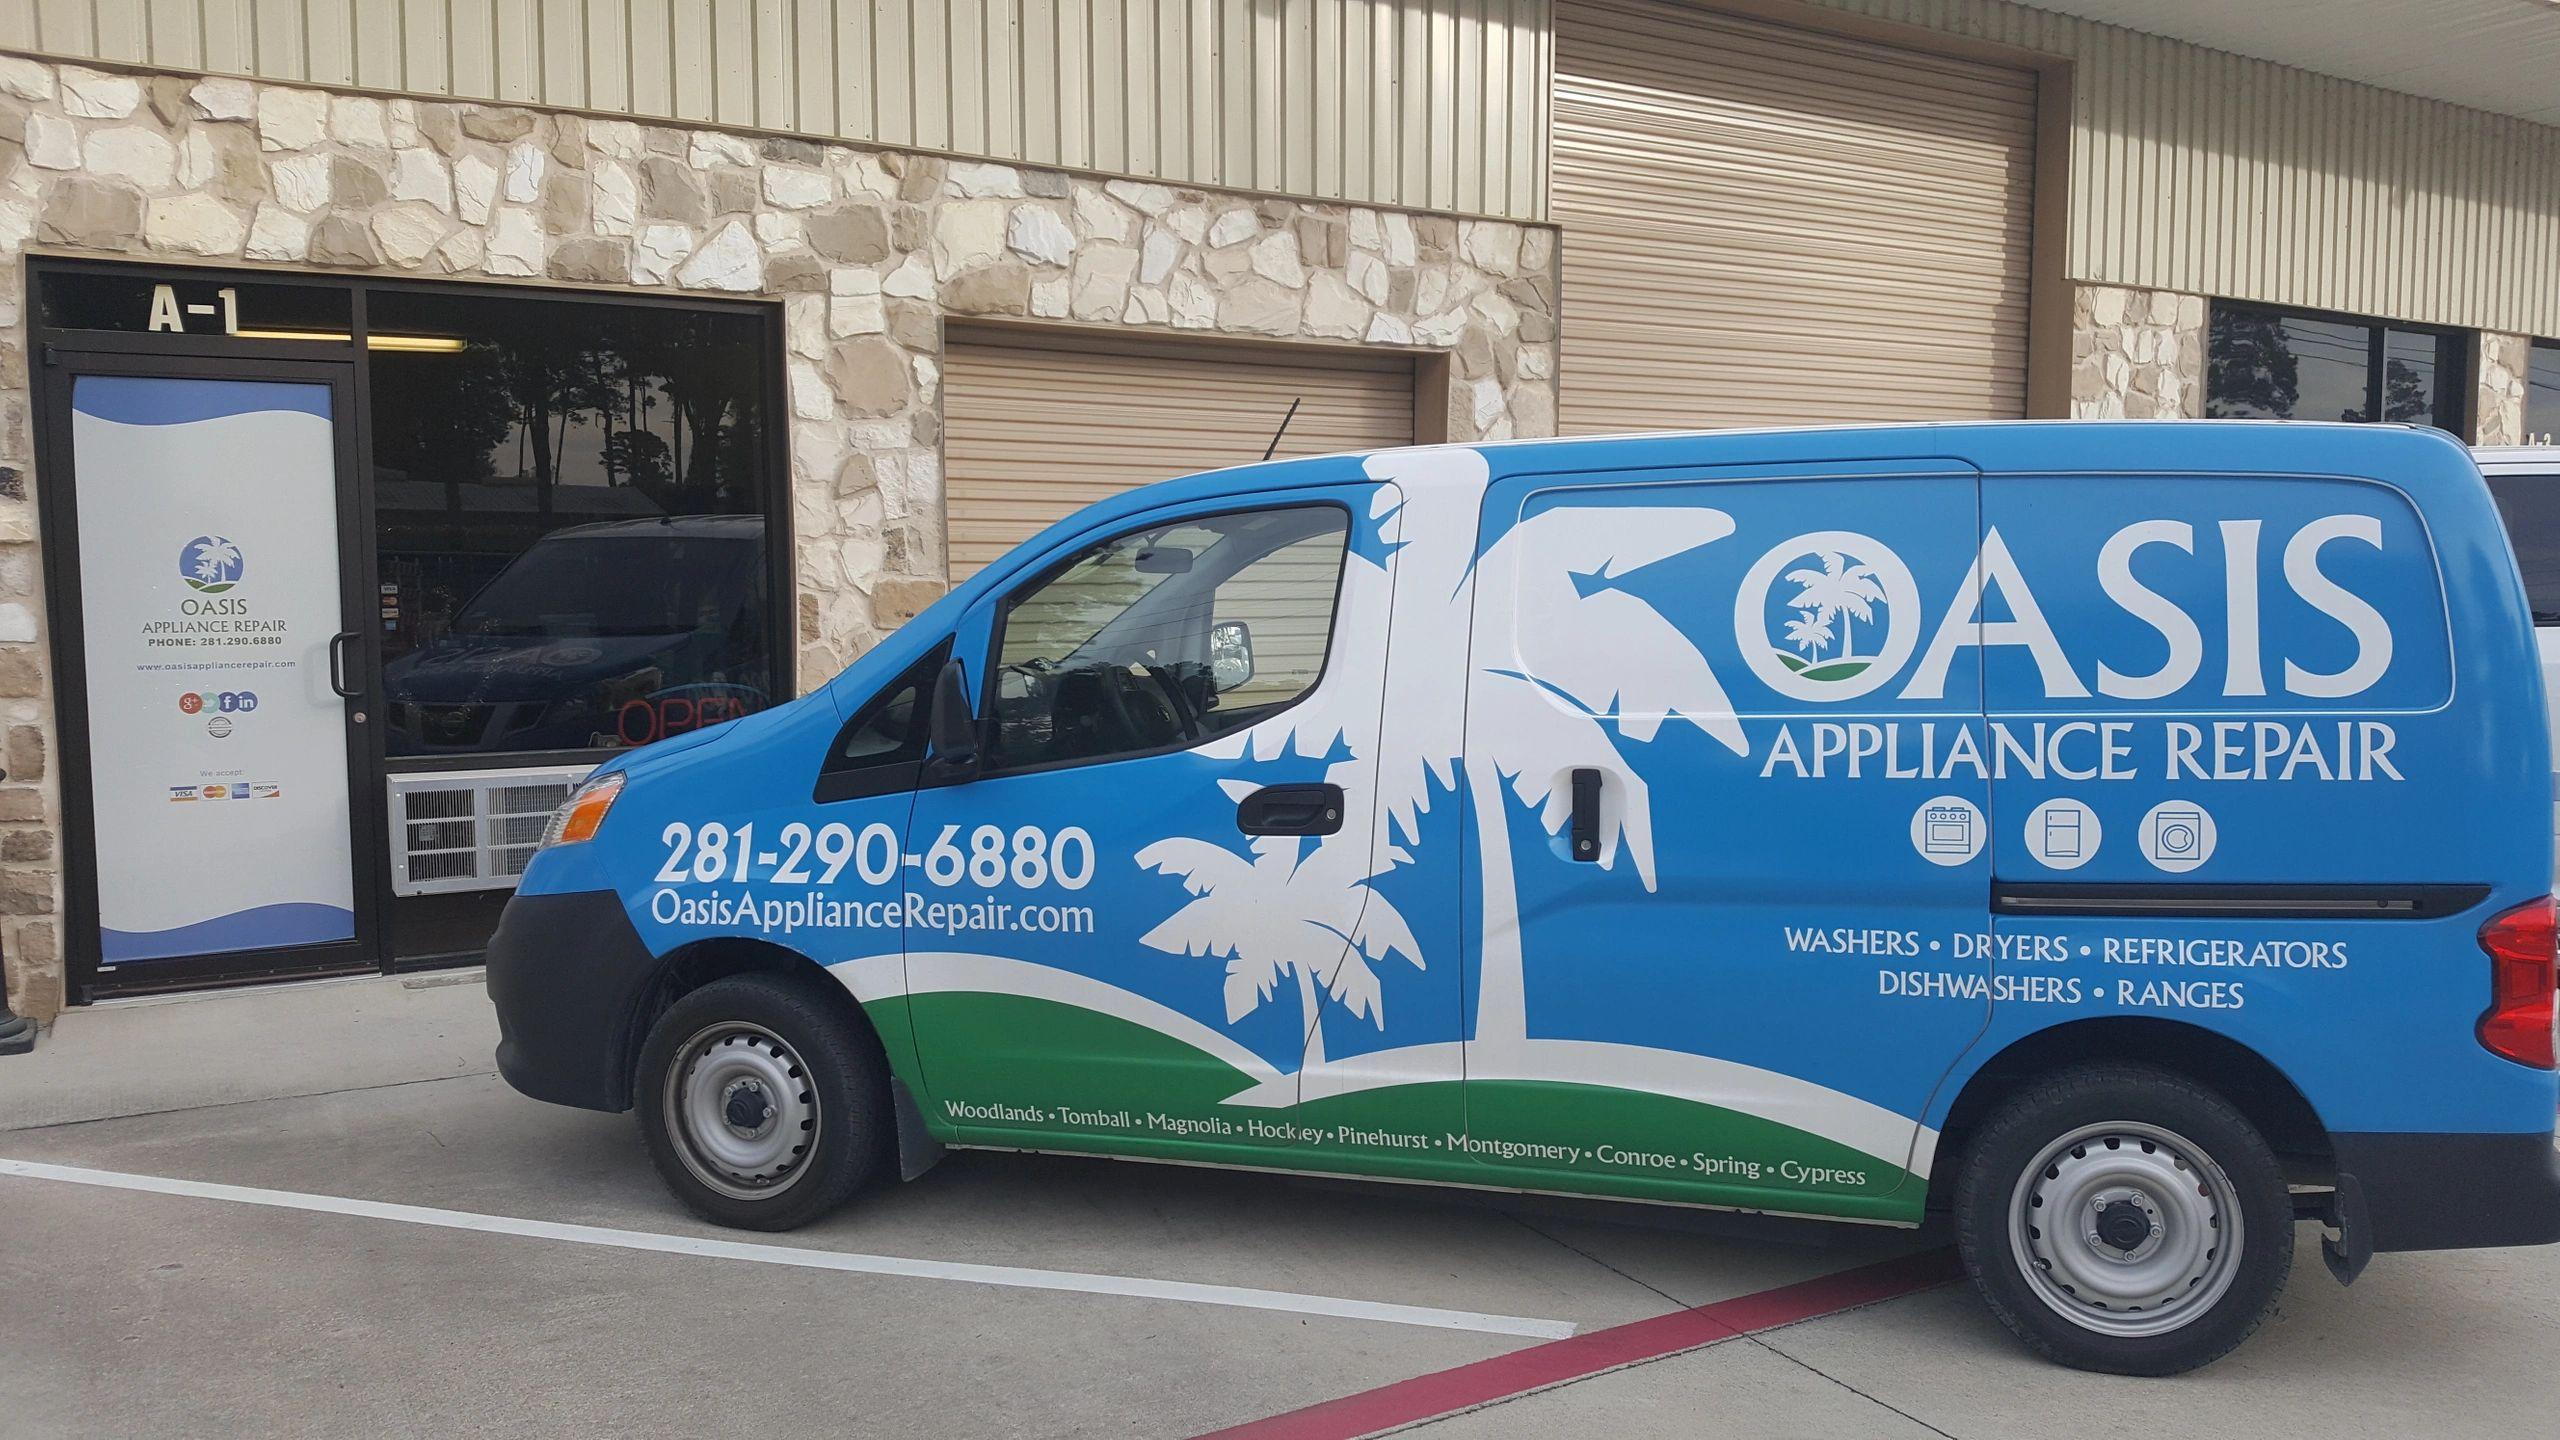 Appliance Repair - Oasis Appliance Repair